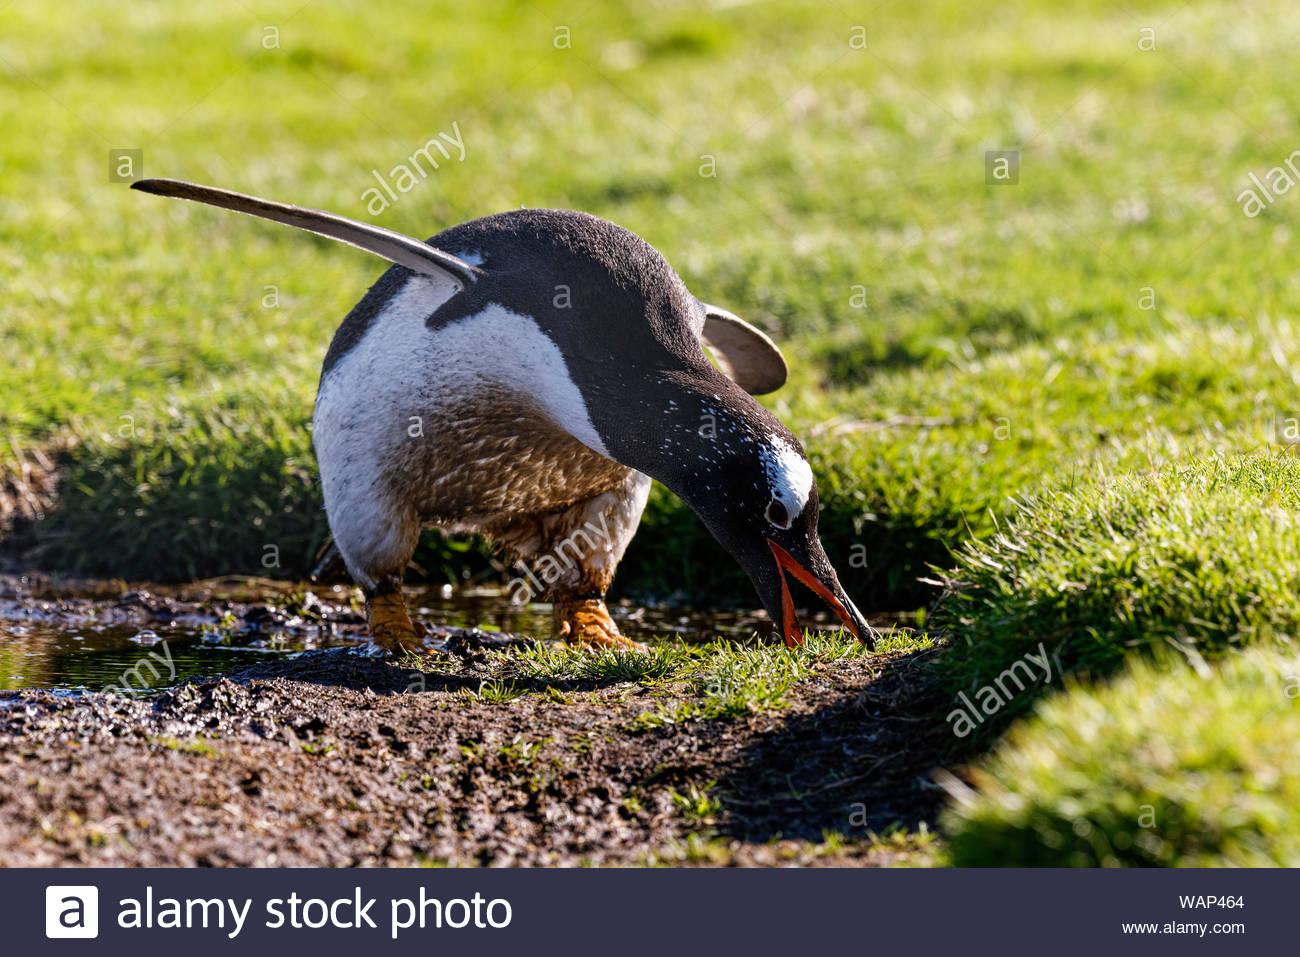 Eselspinguin (Pygoscelis papua), Falkland Inseln. Gentoo penguin, Falkland Islands Stock Photo